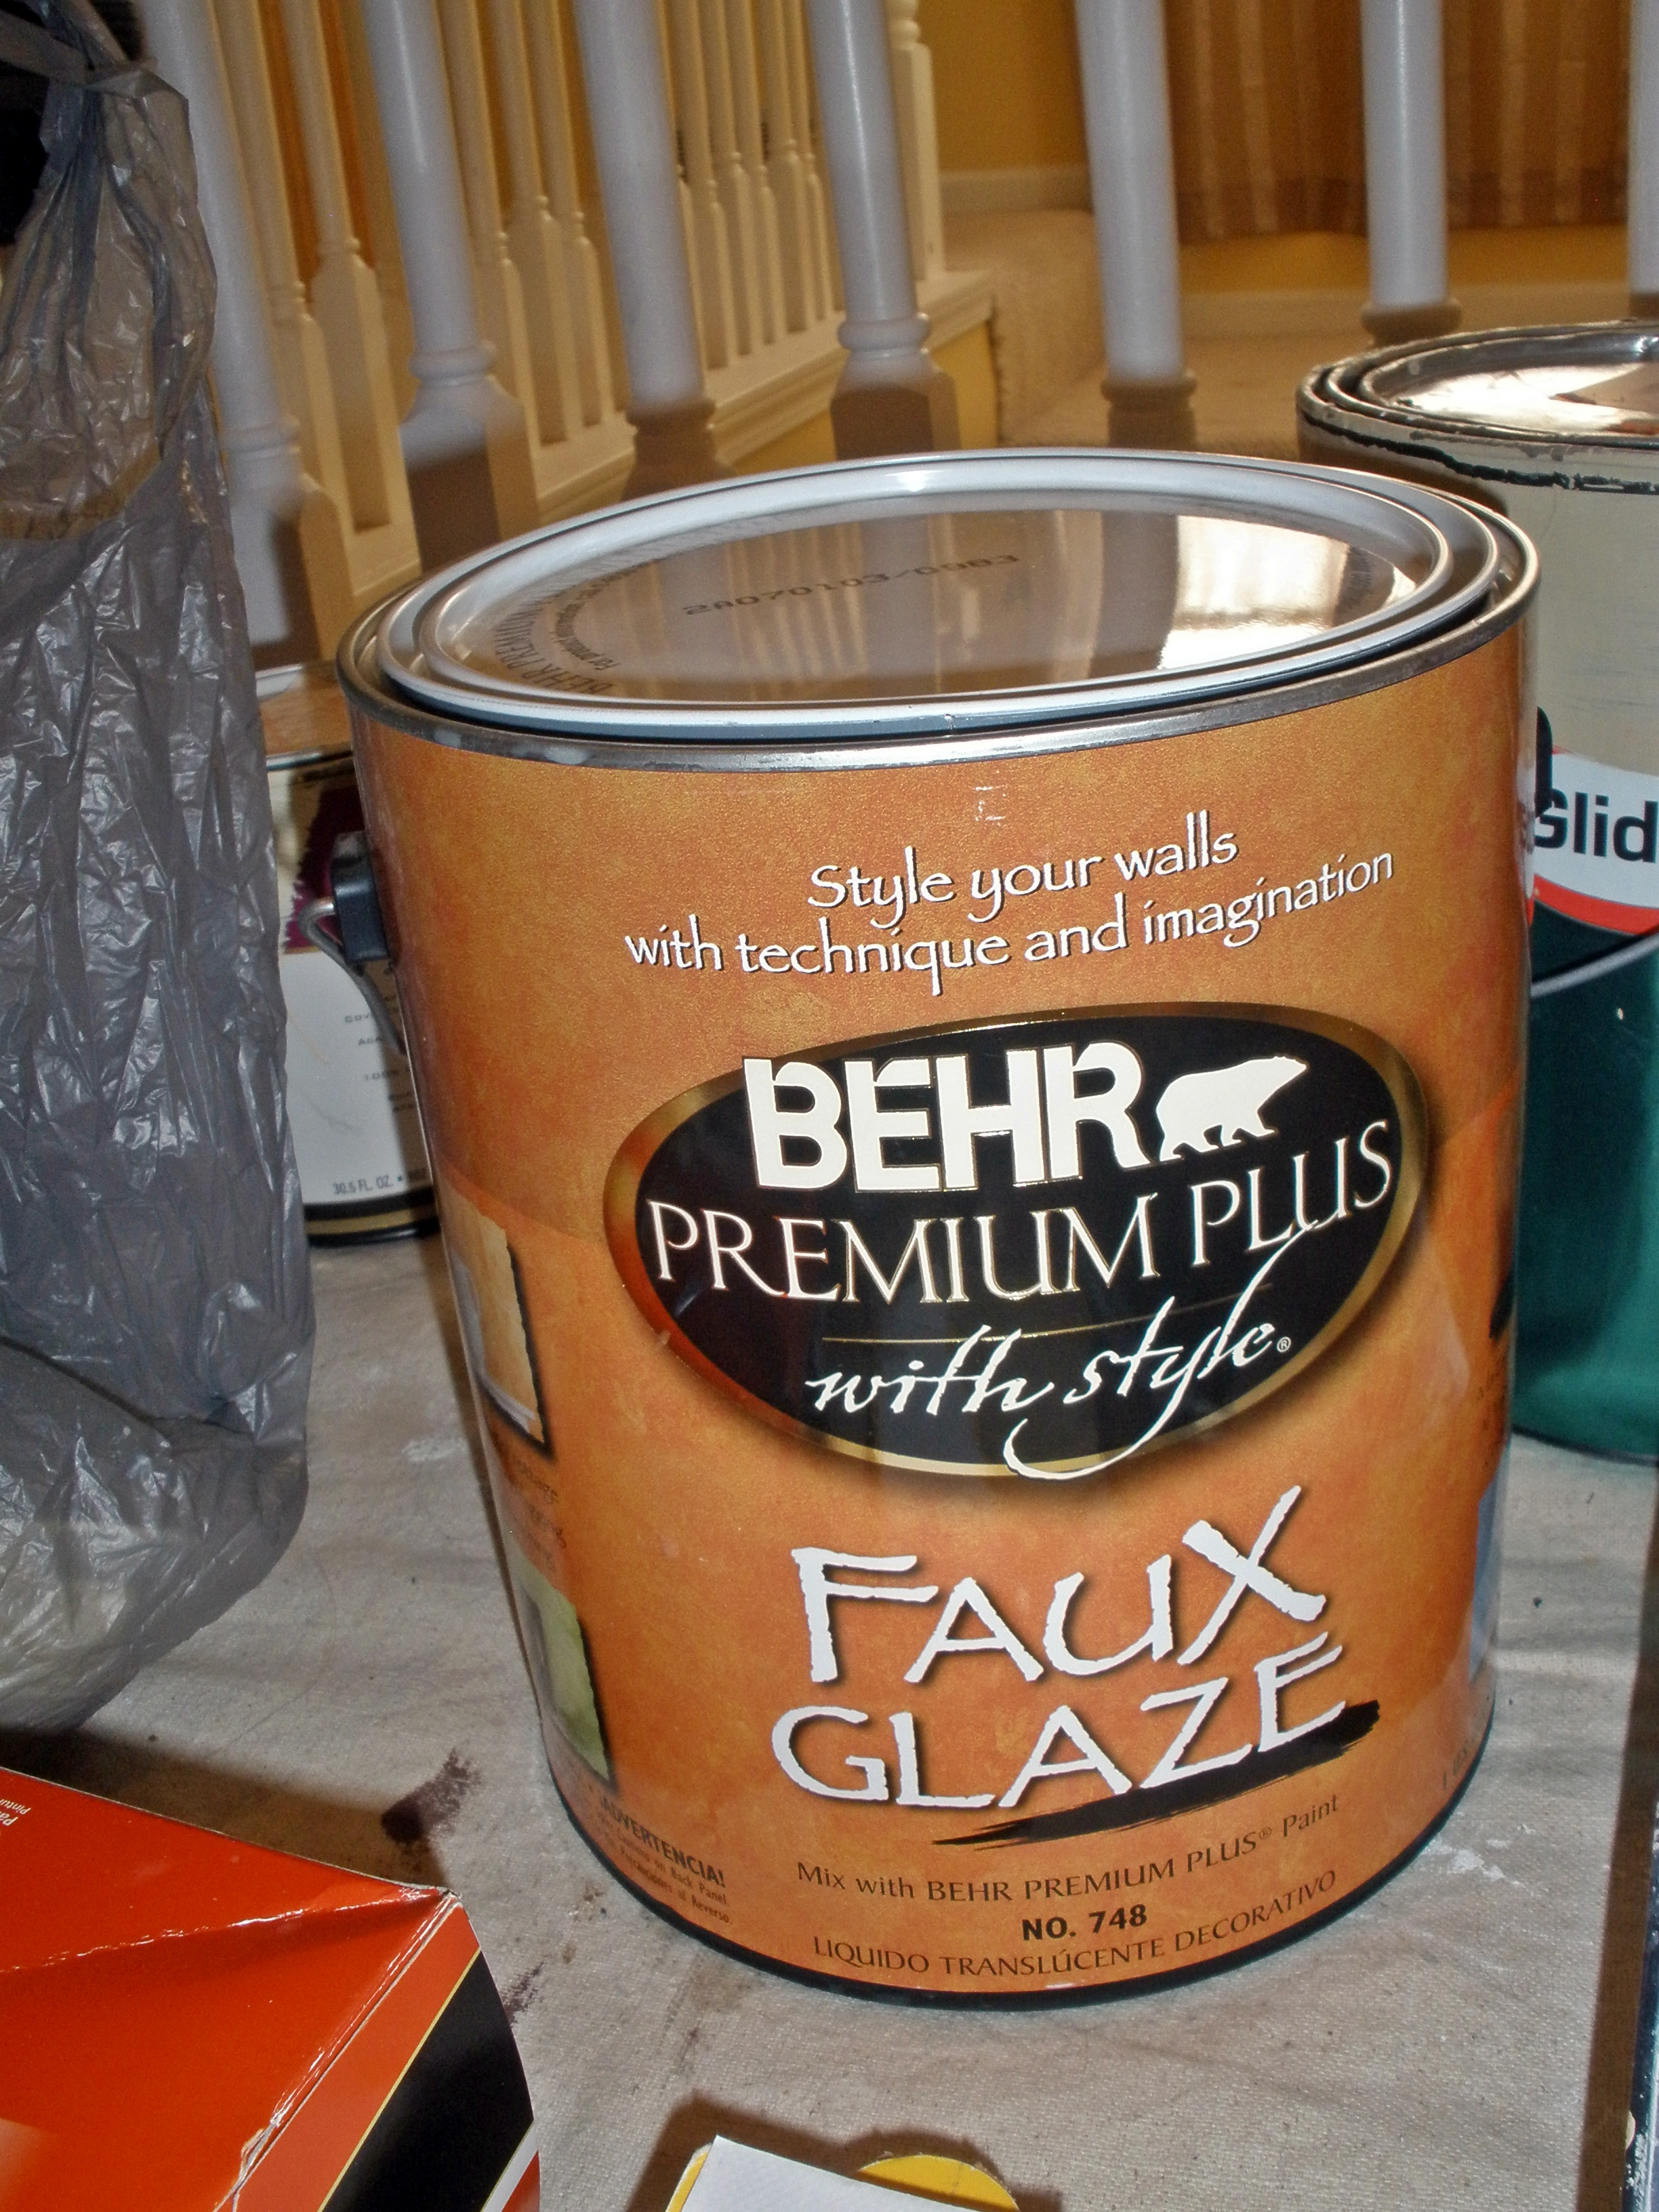 Pictures Of Behr Faux Glaze Architectural Paint